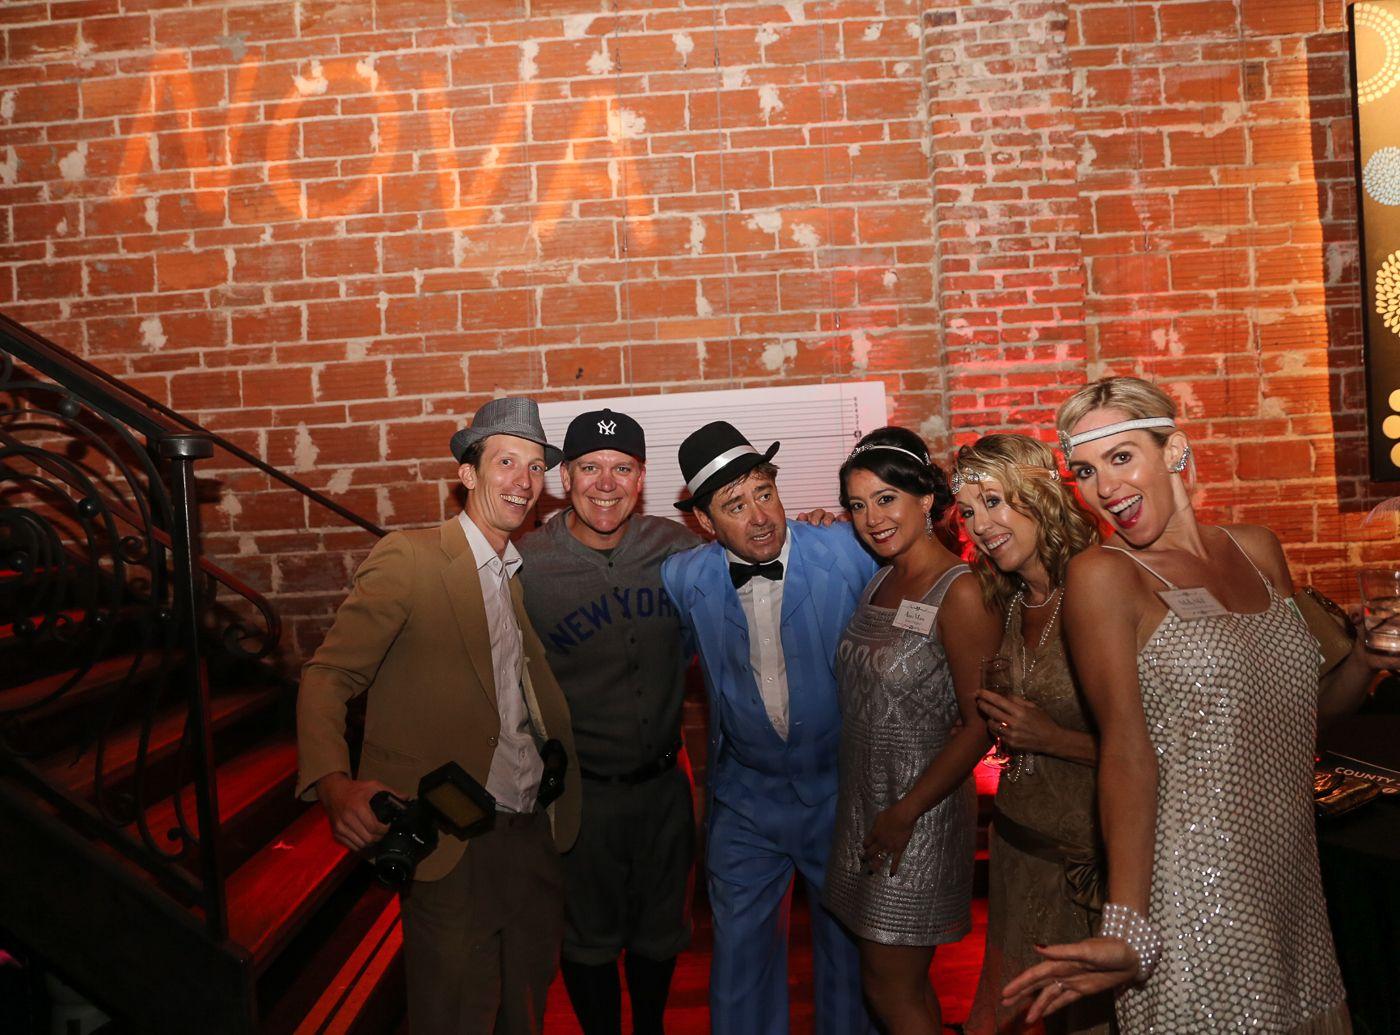 2015 11-28 Olsen-20th-Anniversary-Party-at-venue-NOVA-535-downtown-StPete-DTSP-110